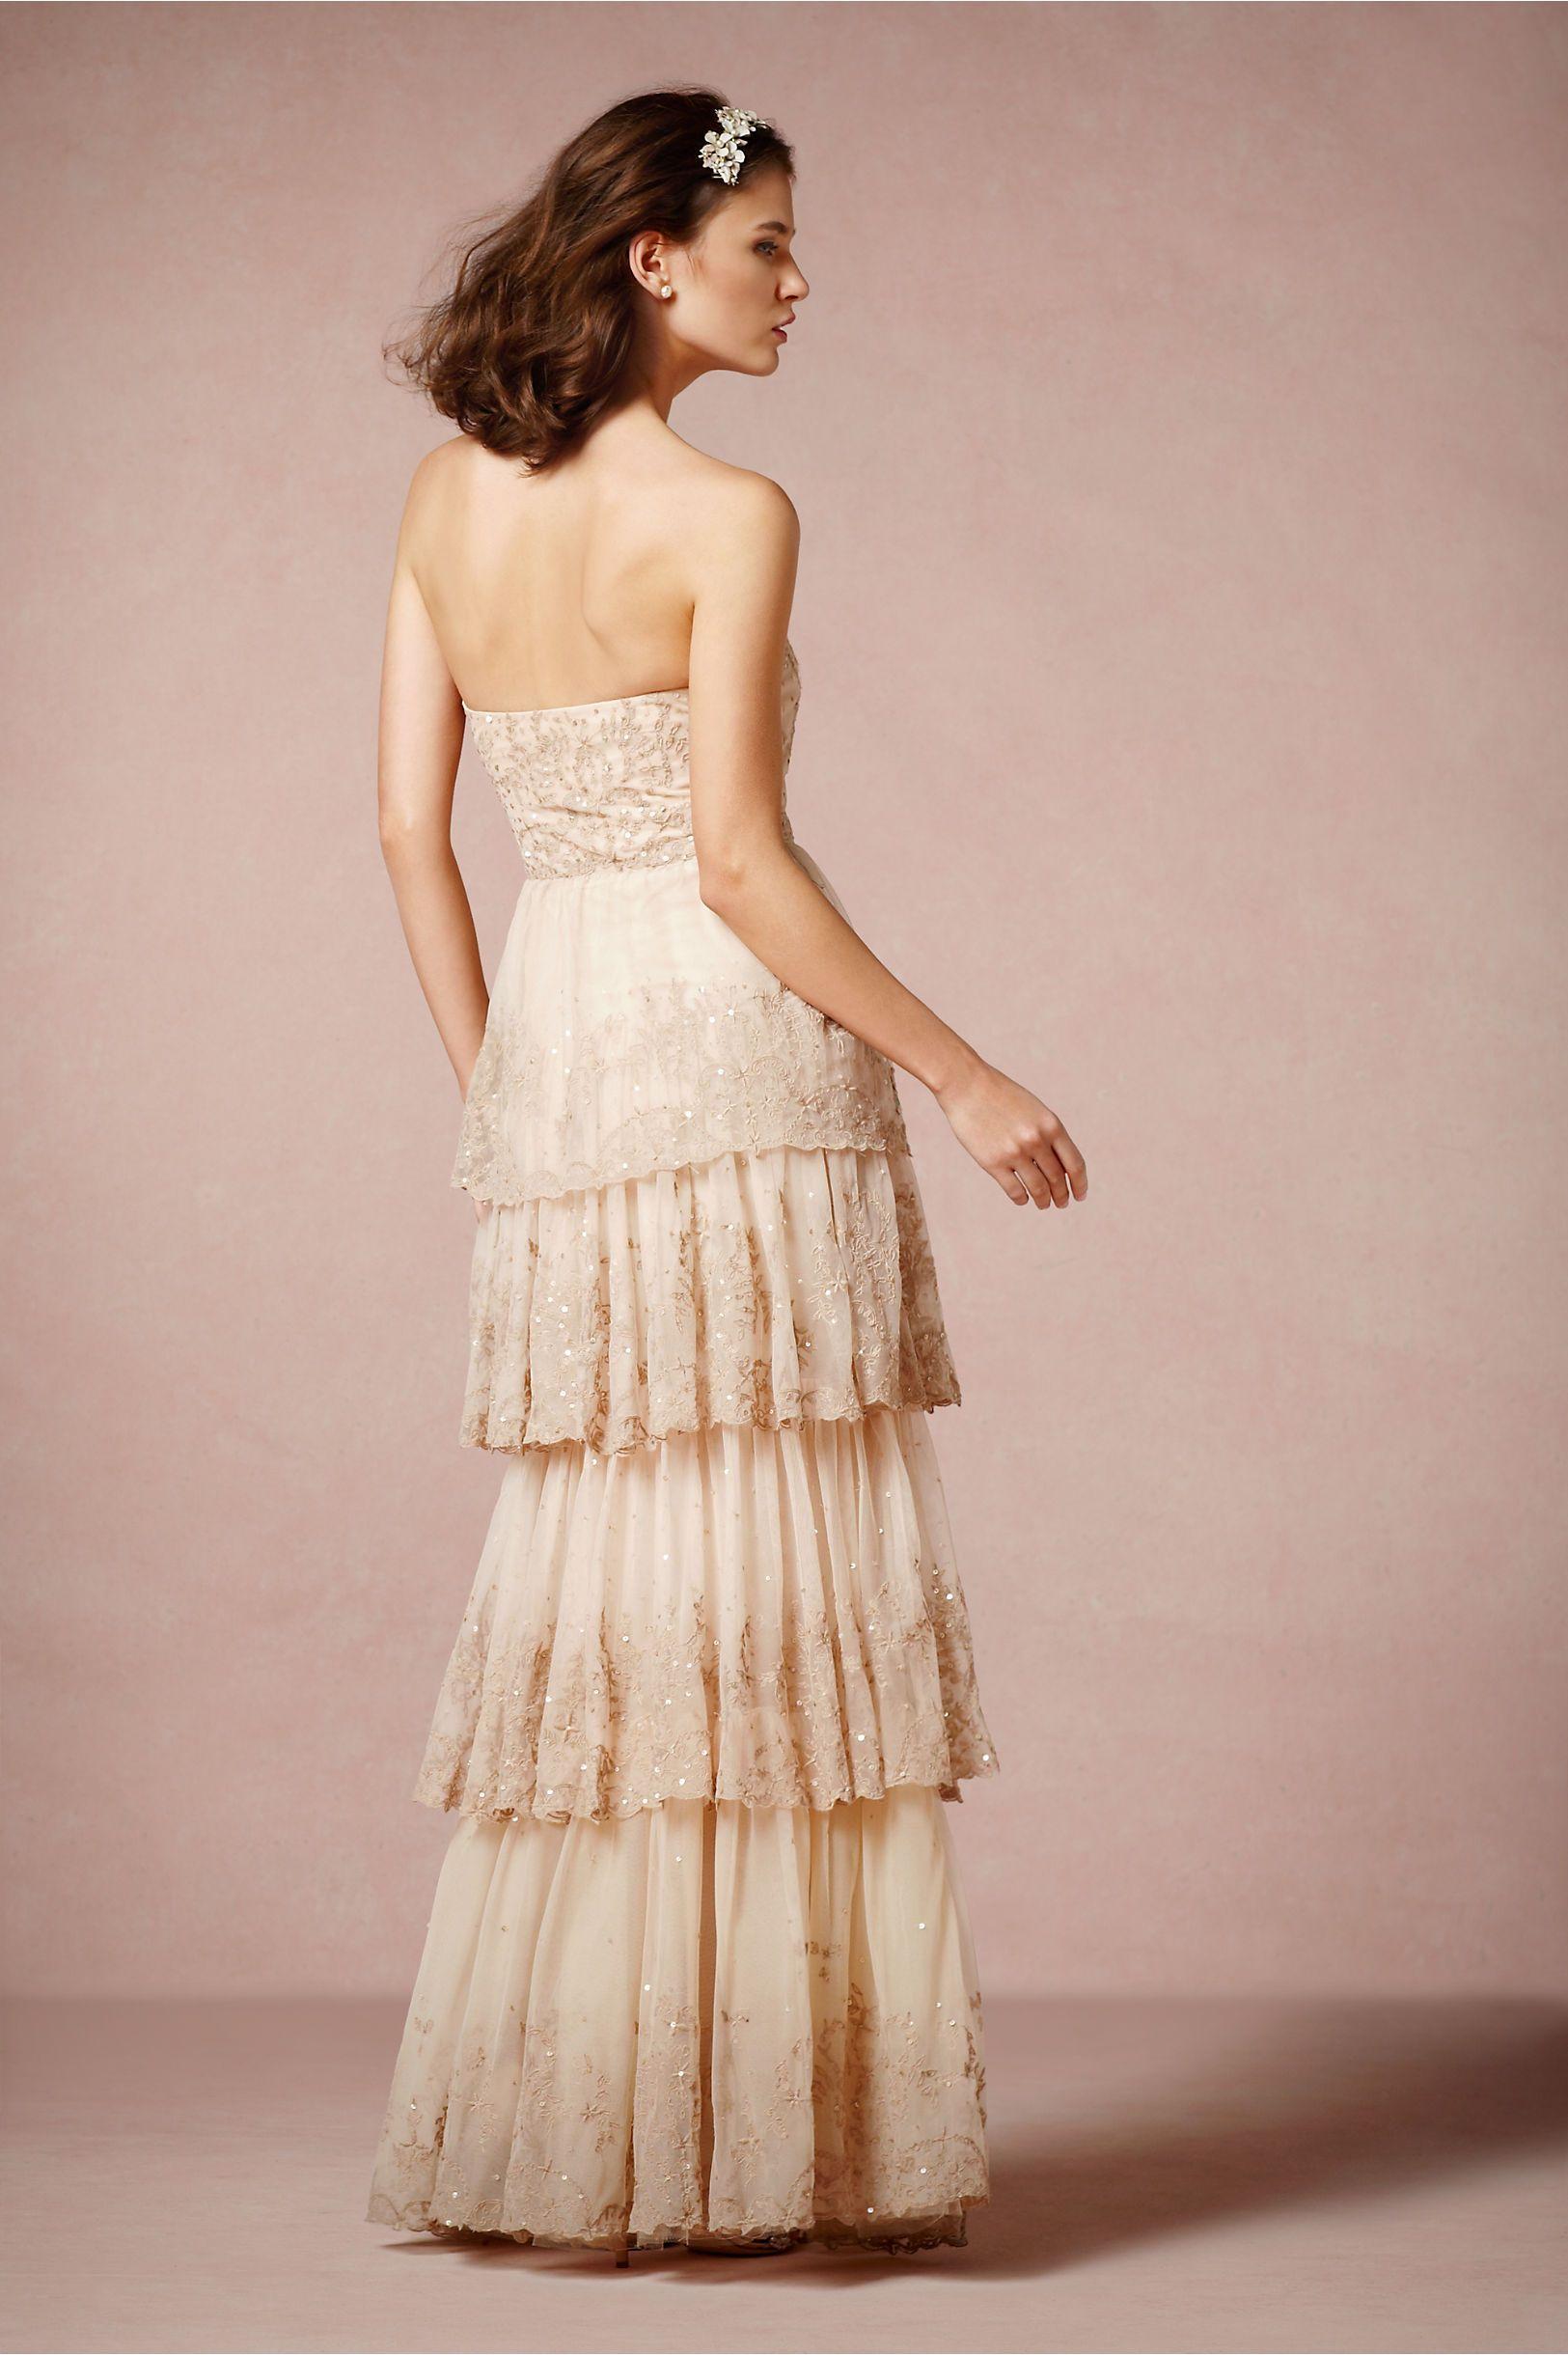 Rosecliff Gown from BHLDN | Ideas de boda | Pinterest | Ideas de ...